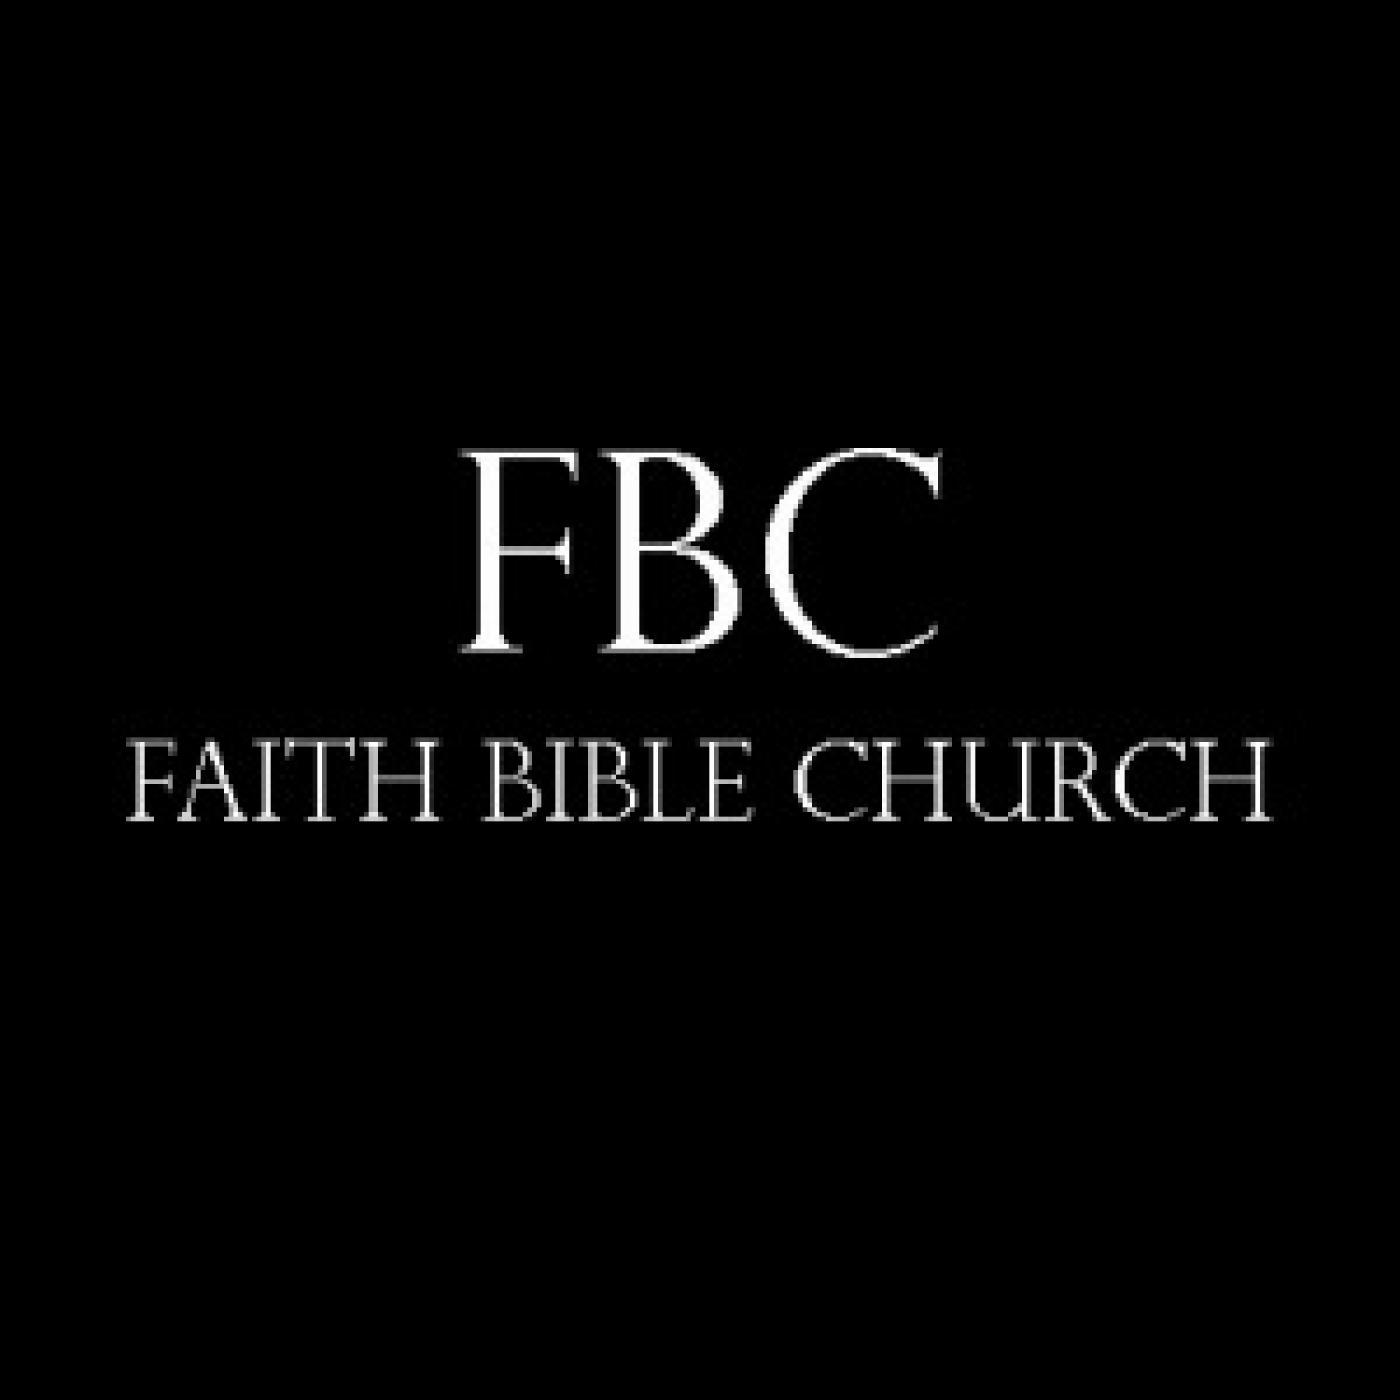 Faith Bible Church in McKinney, Texas